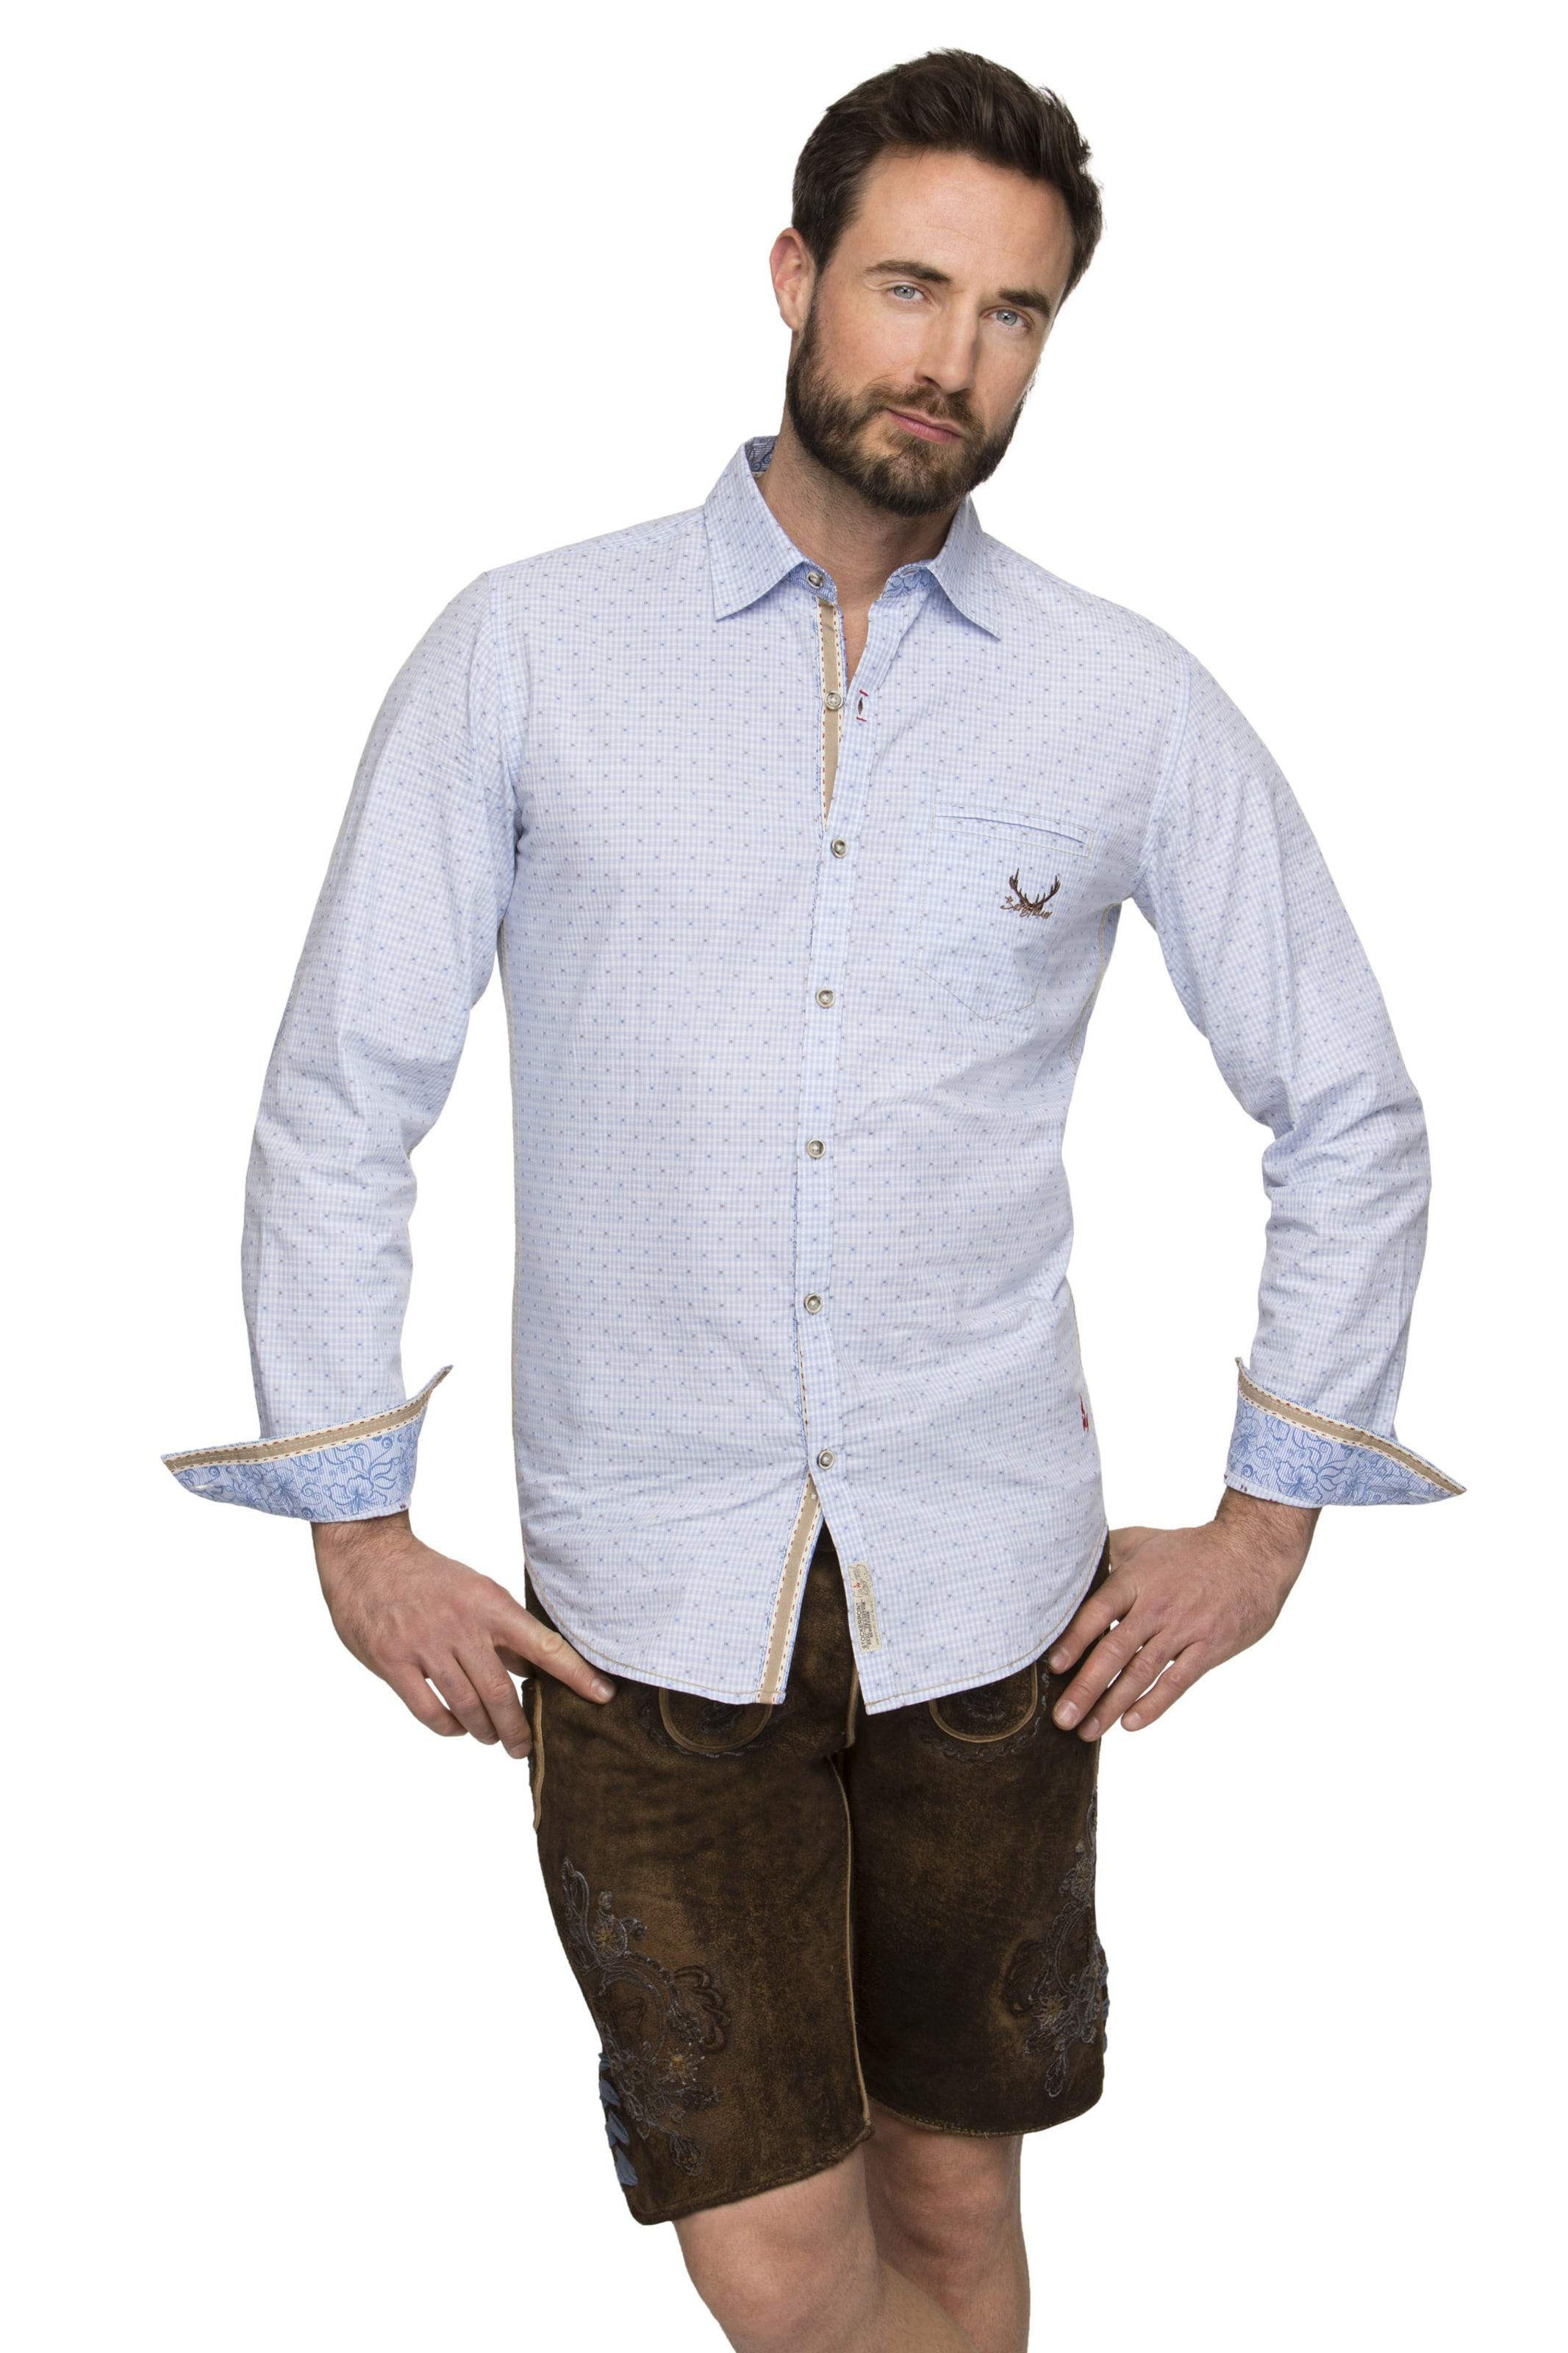 STOCKERPOINT Hemd Jesse Billig Verkaufen Low-Cost GZ82v